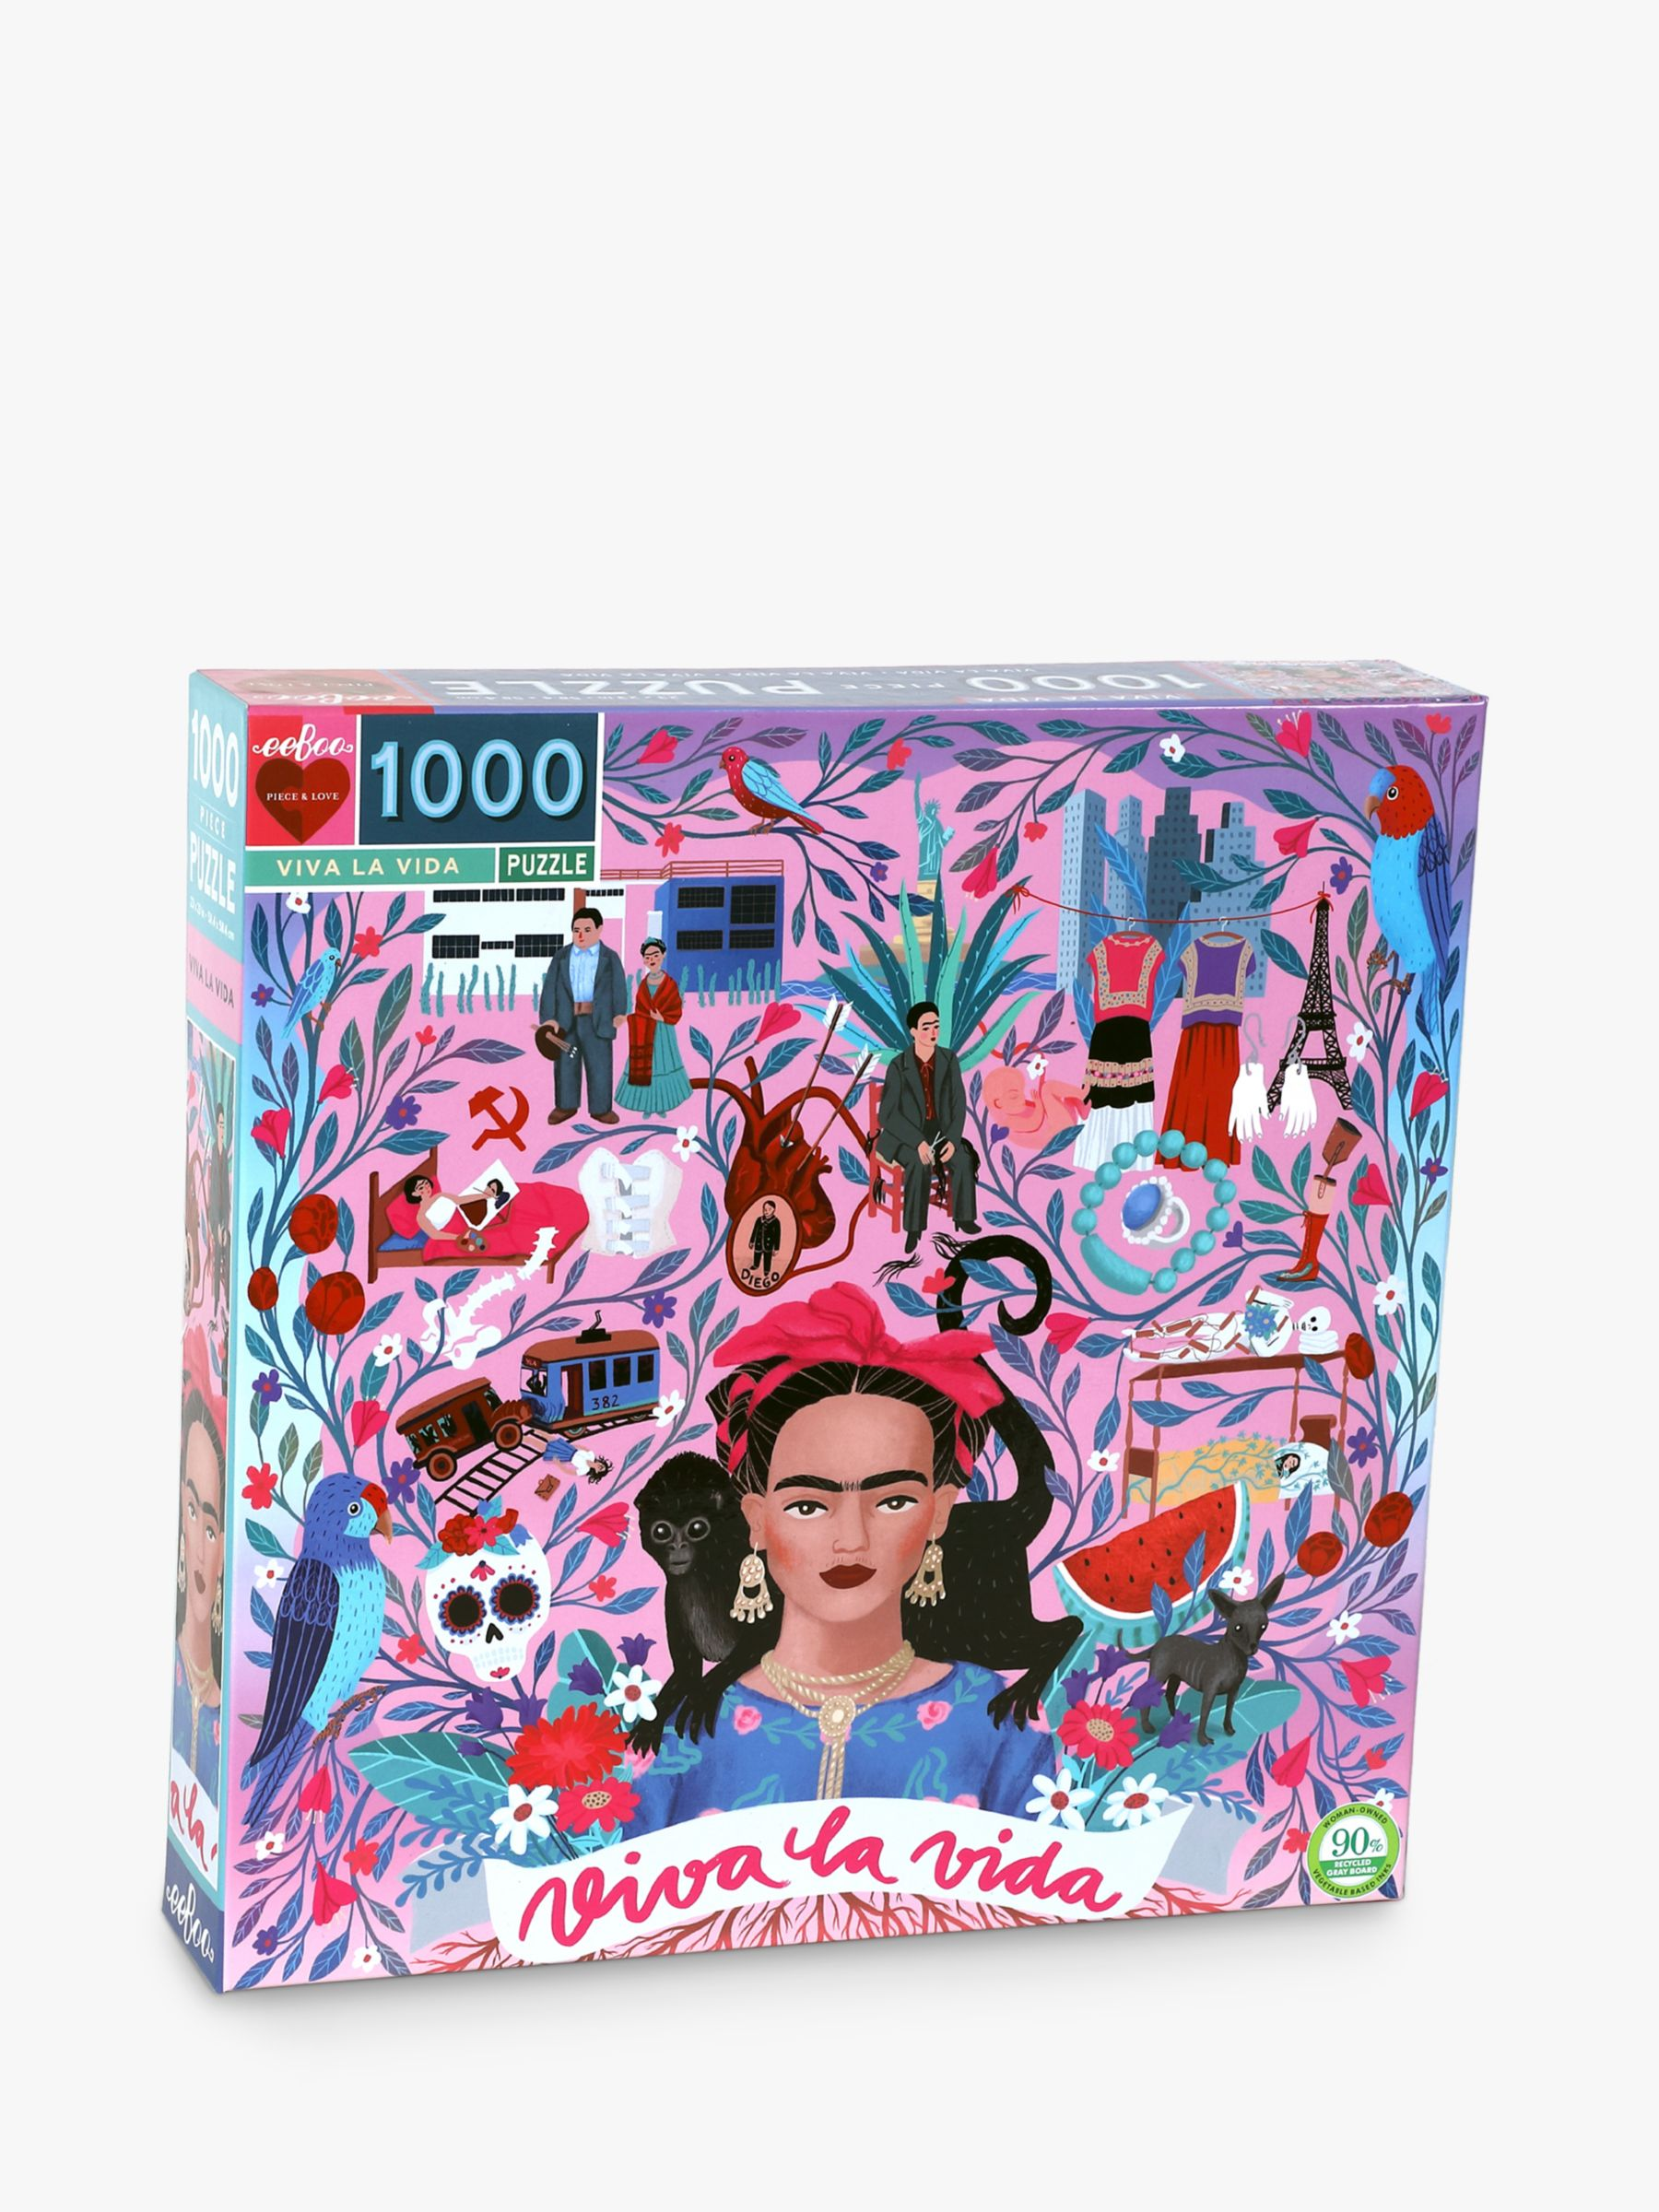 Eeboo eeBoo Viva La Vida Frida Kahlo Jigsaw Puzzle, 1000 Pieces